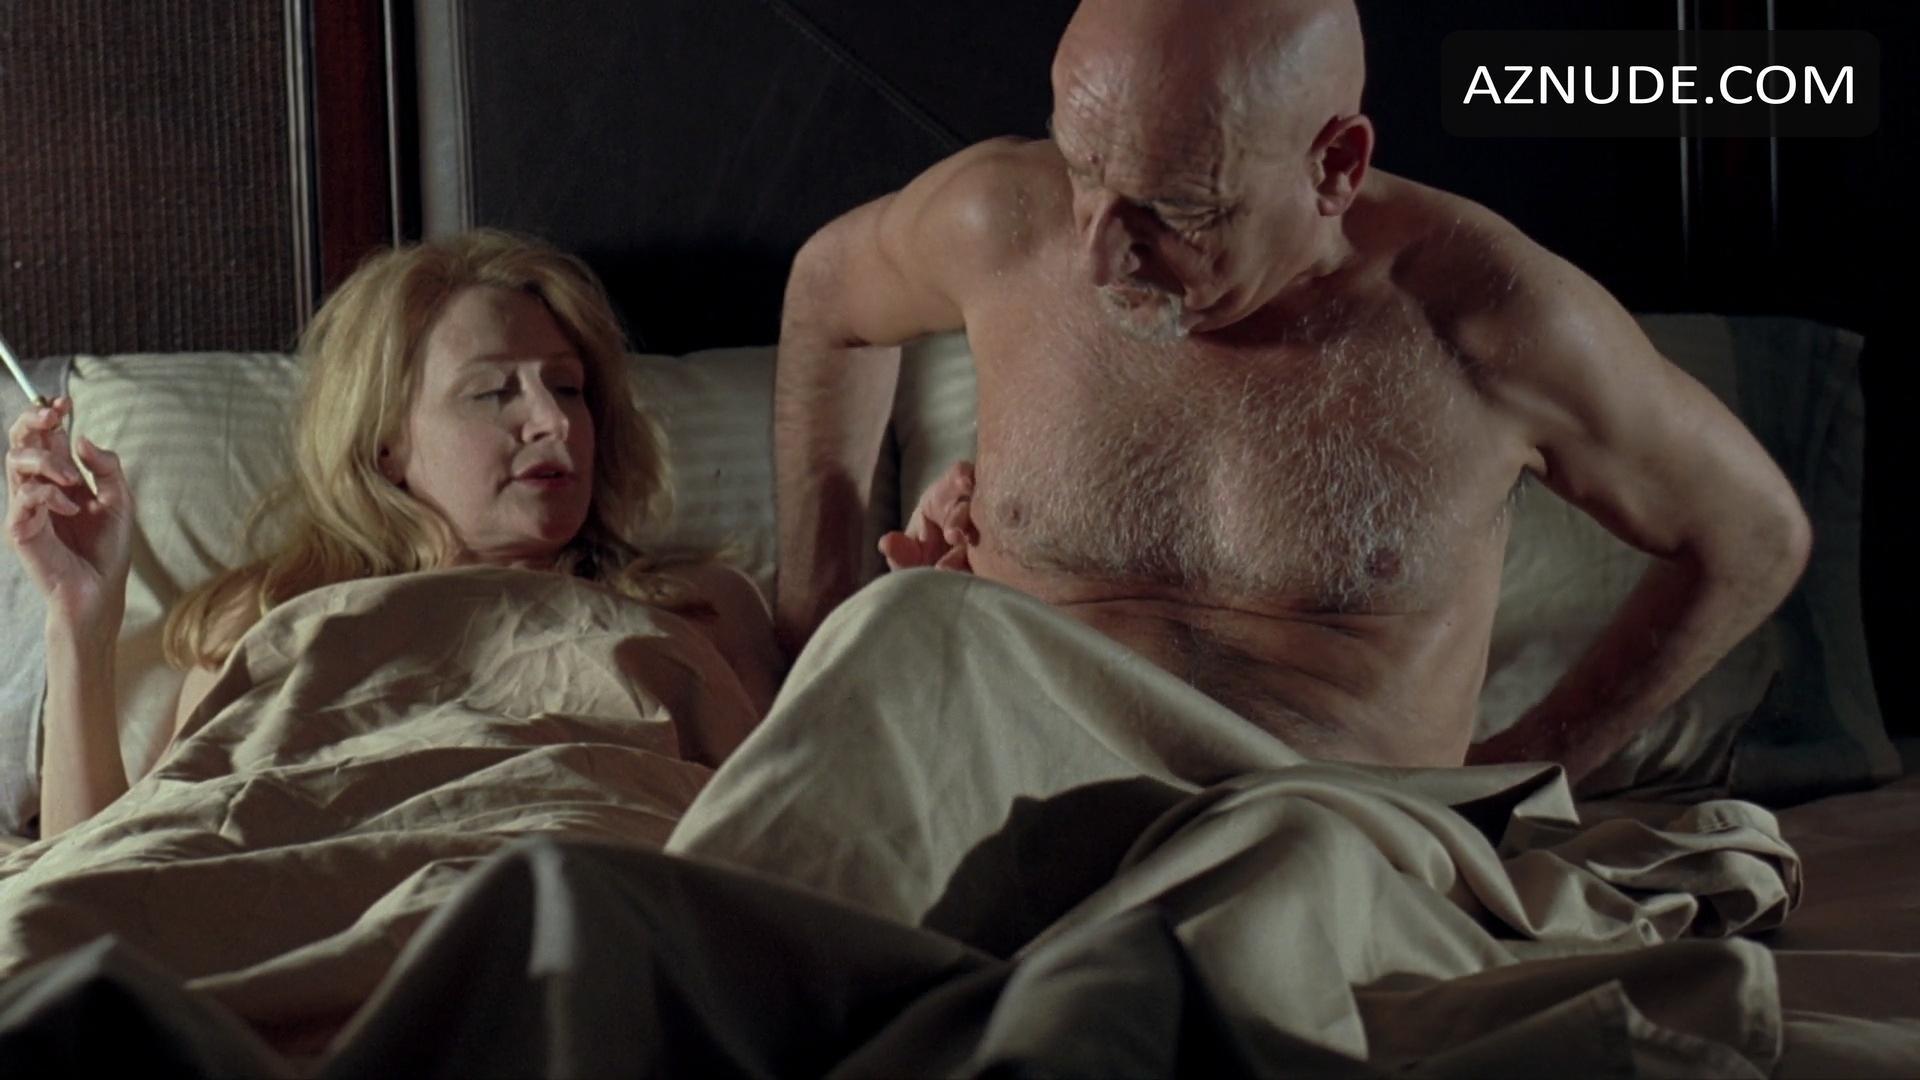 Ben Kingsley Nude - Aznude Men-2481